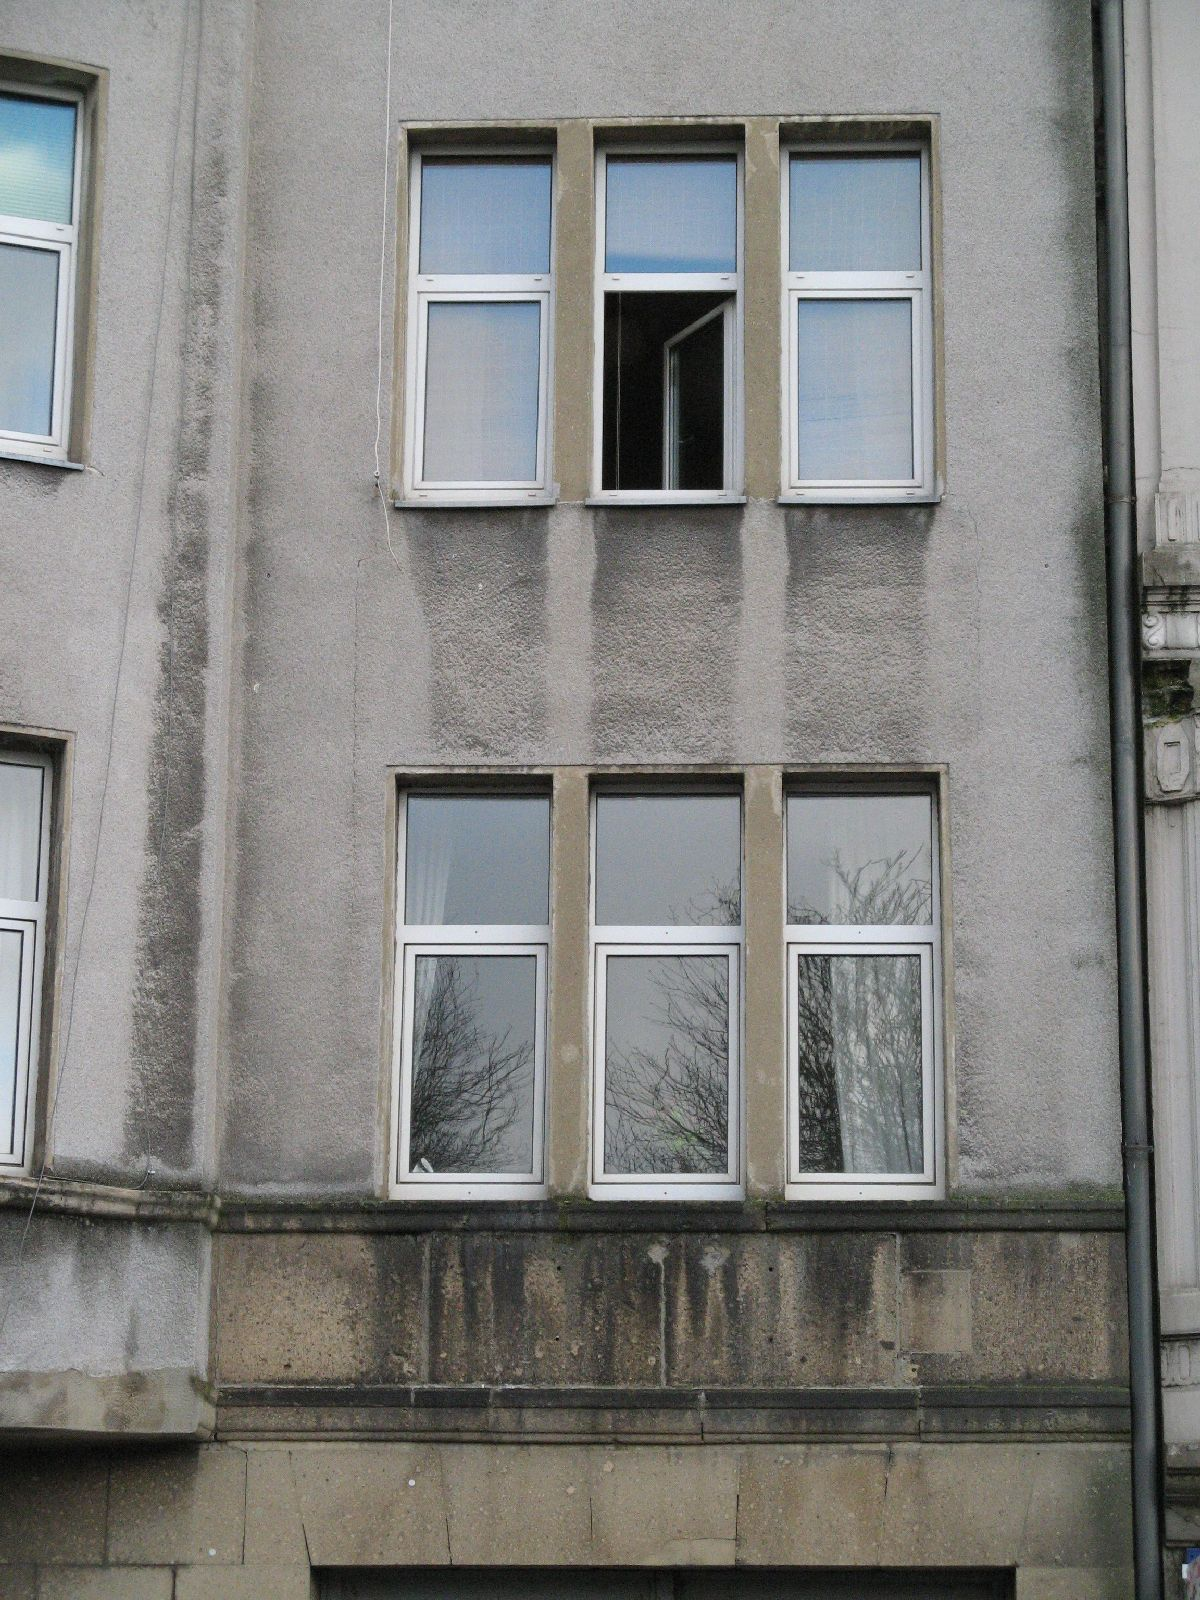 Building_Texture_B_03756